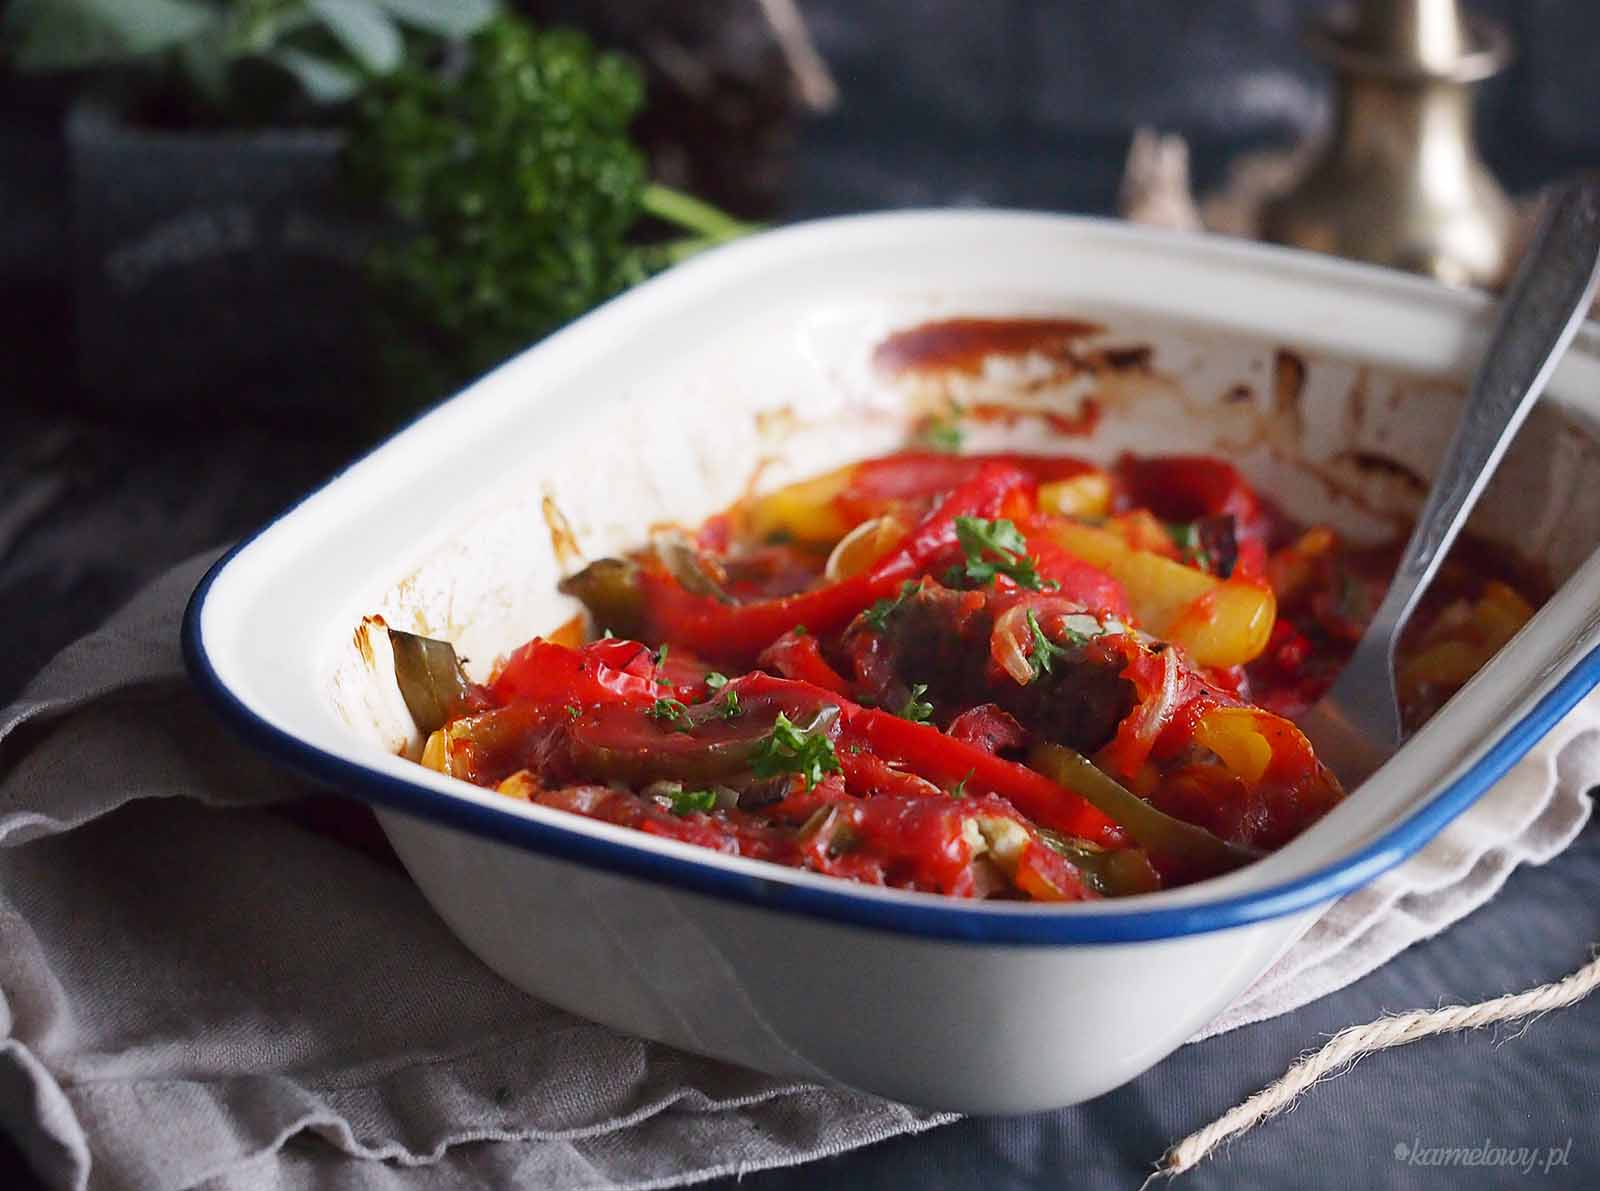 Latwa-wolowina-zapiekana-z-papryka-Easy-beef-and-pepper-bake